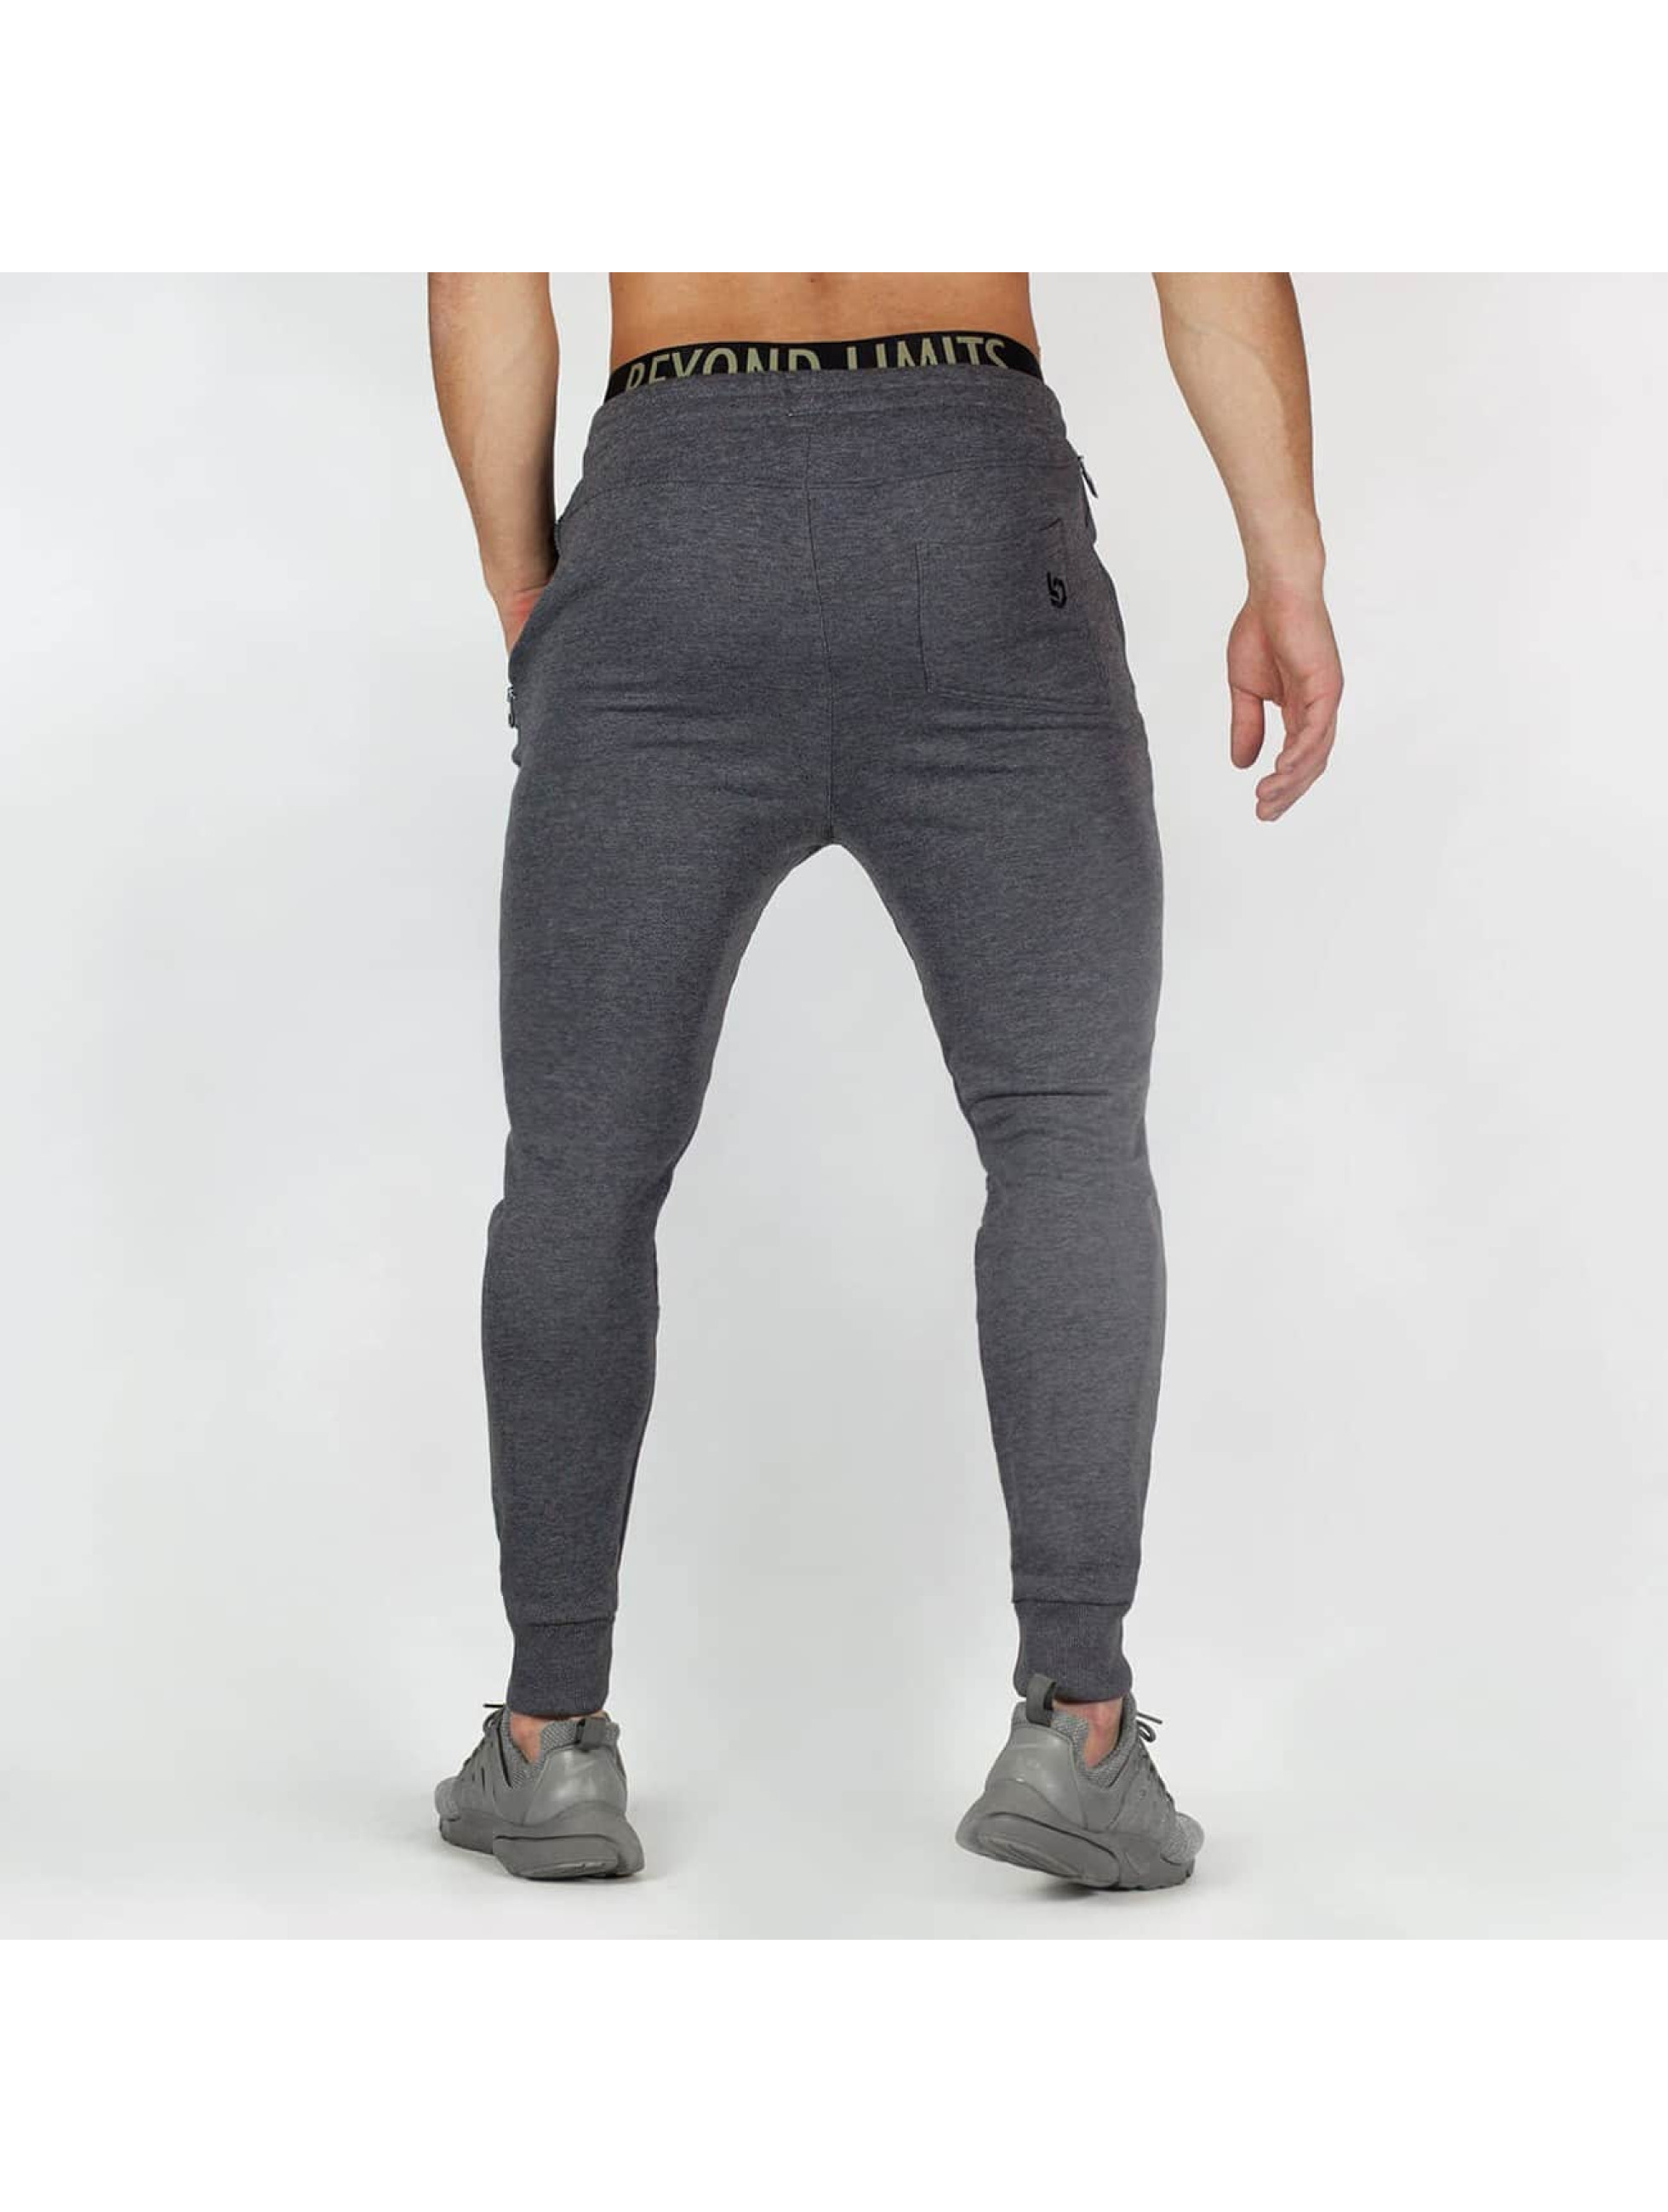 Beyond Limits Jogging Baseline gris